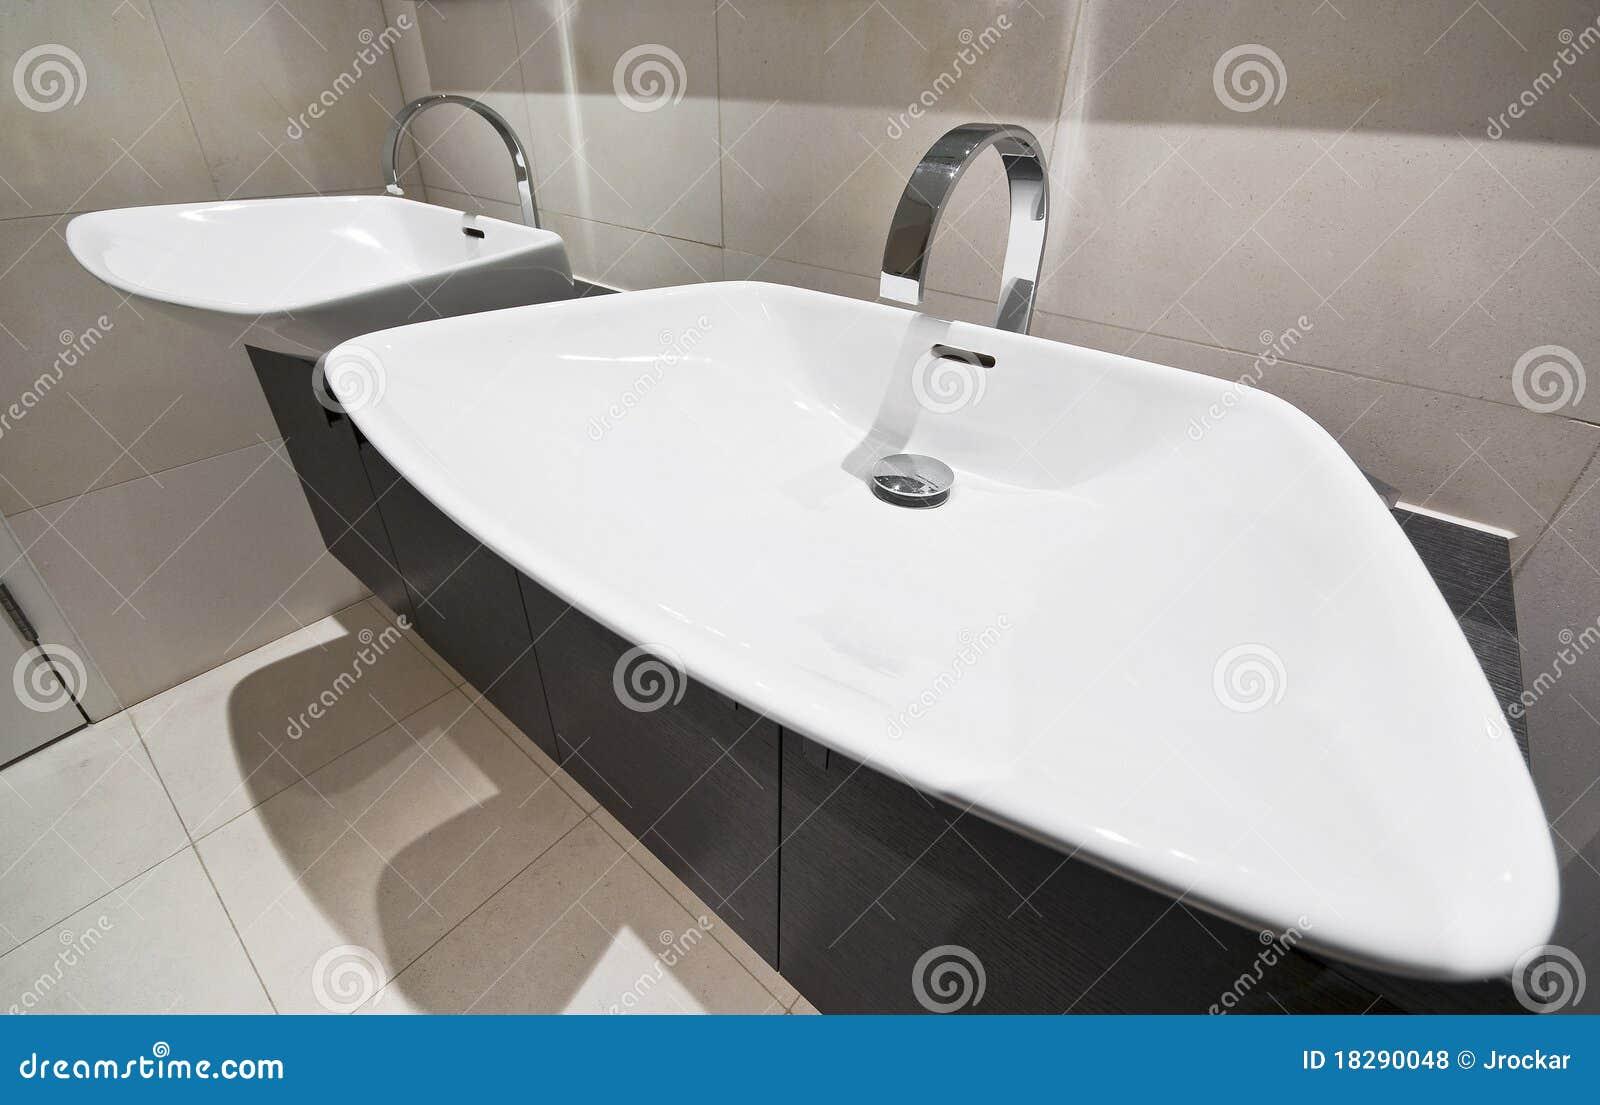 Double bathroom hand wash basin royalty free stock photos - Double wash basin bathroom ...